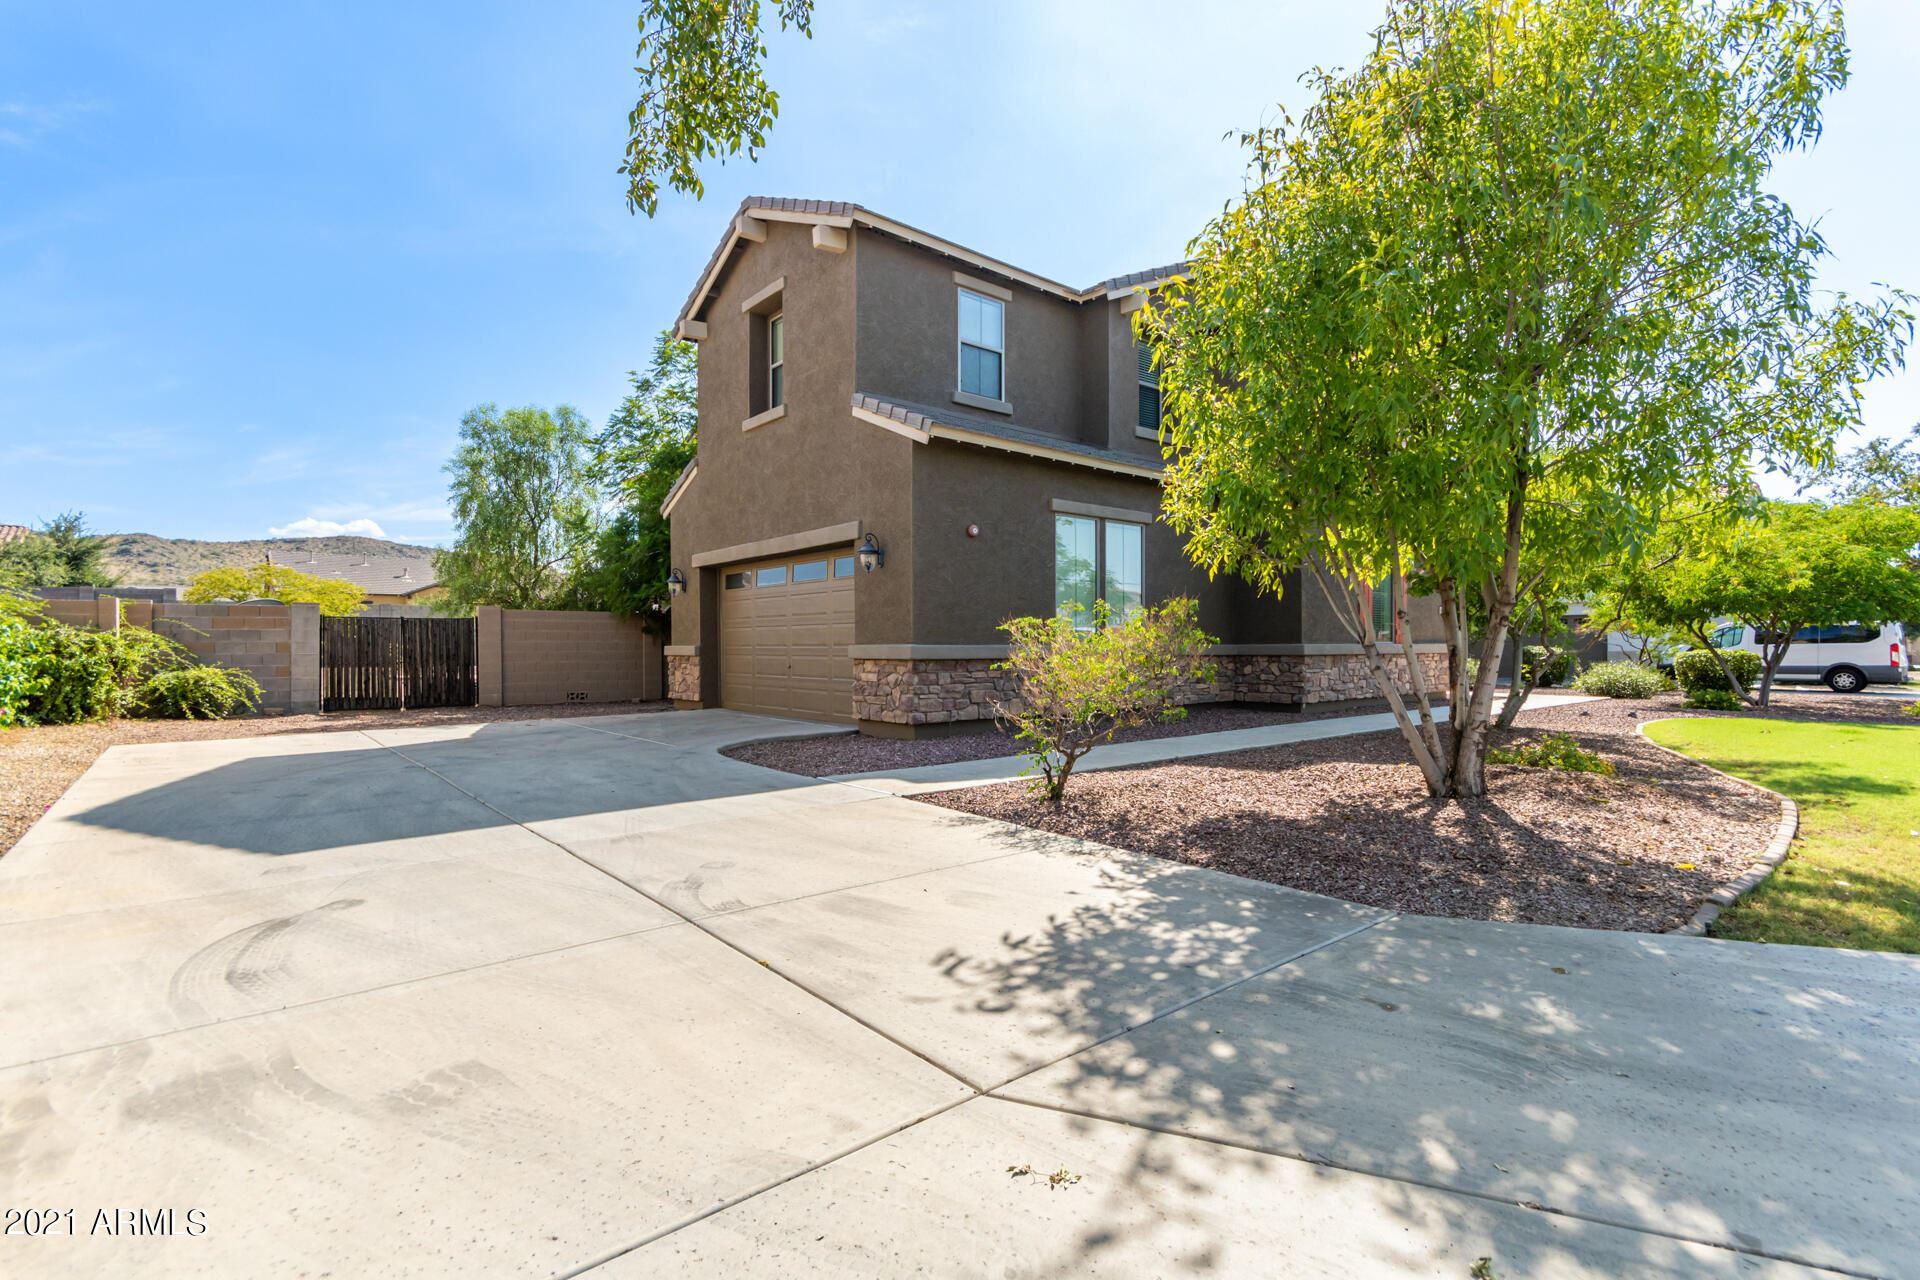 Photo of 4513 W LODGE Drive, Laveen, AZ 85339 (MLS # 6289410)